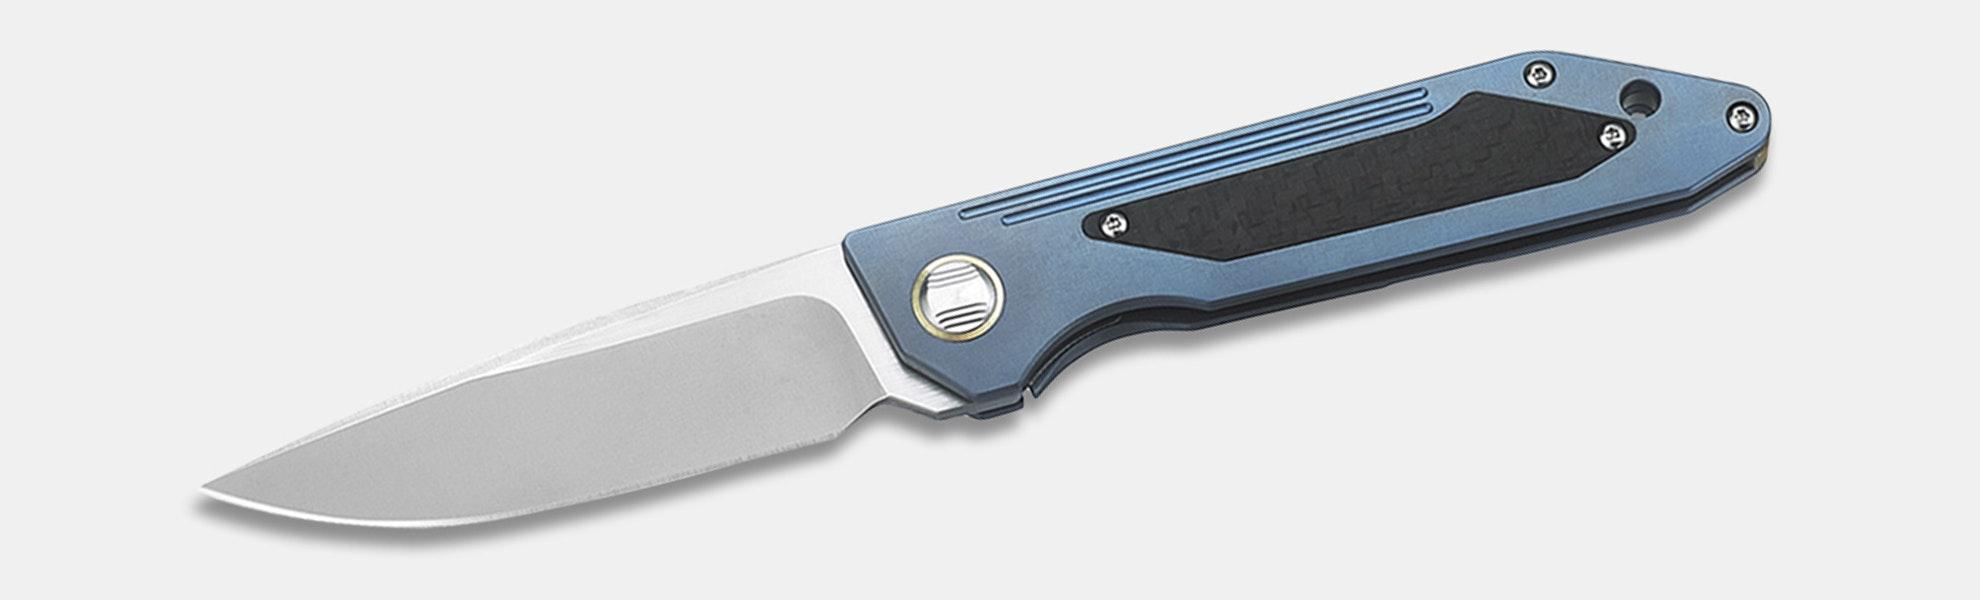 Bestech Shinkansen S35VN Folding Knife